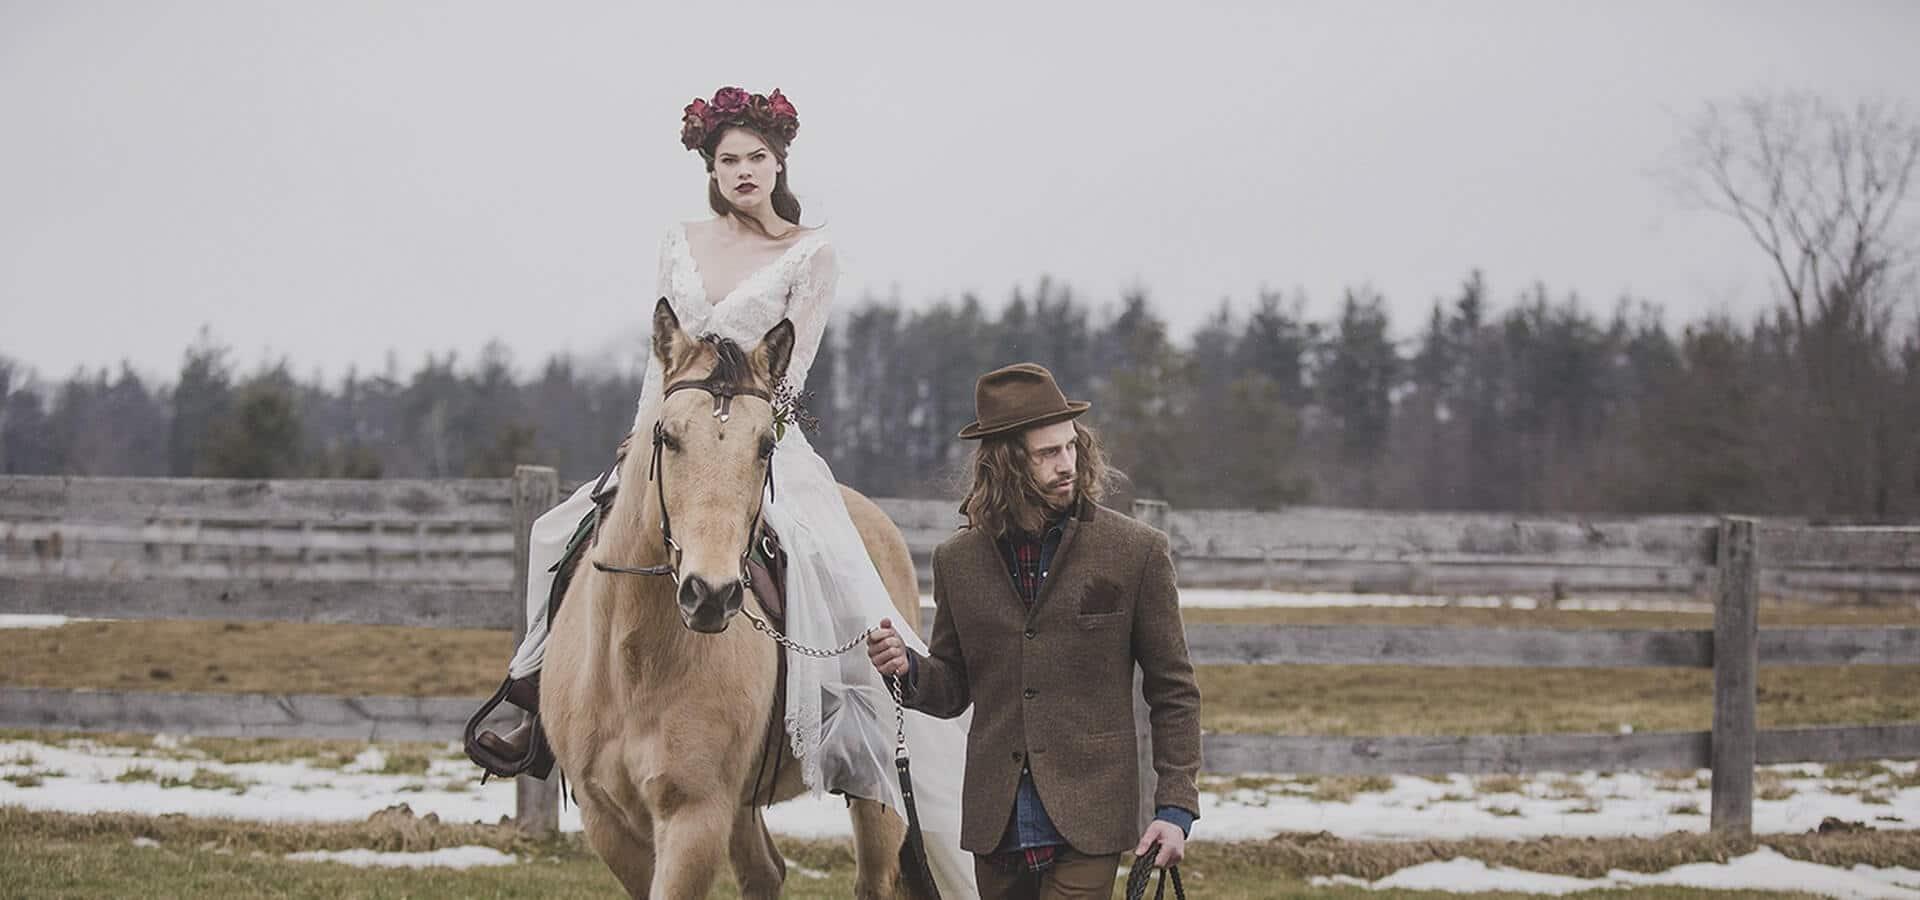 Hero image for A Winter Canadiana Woodland Inspired Styled Shoot at HollyOaks Farm